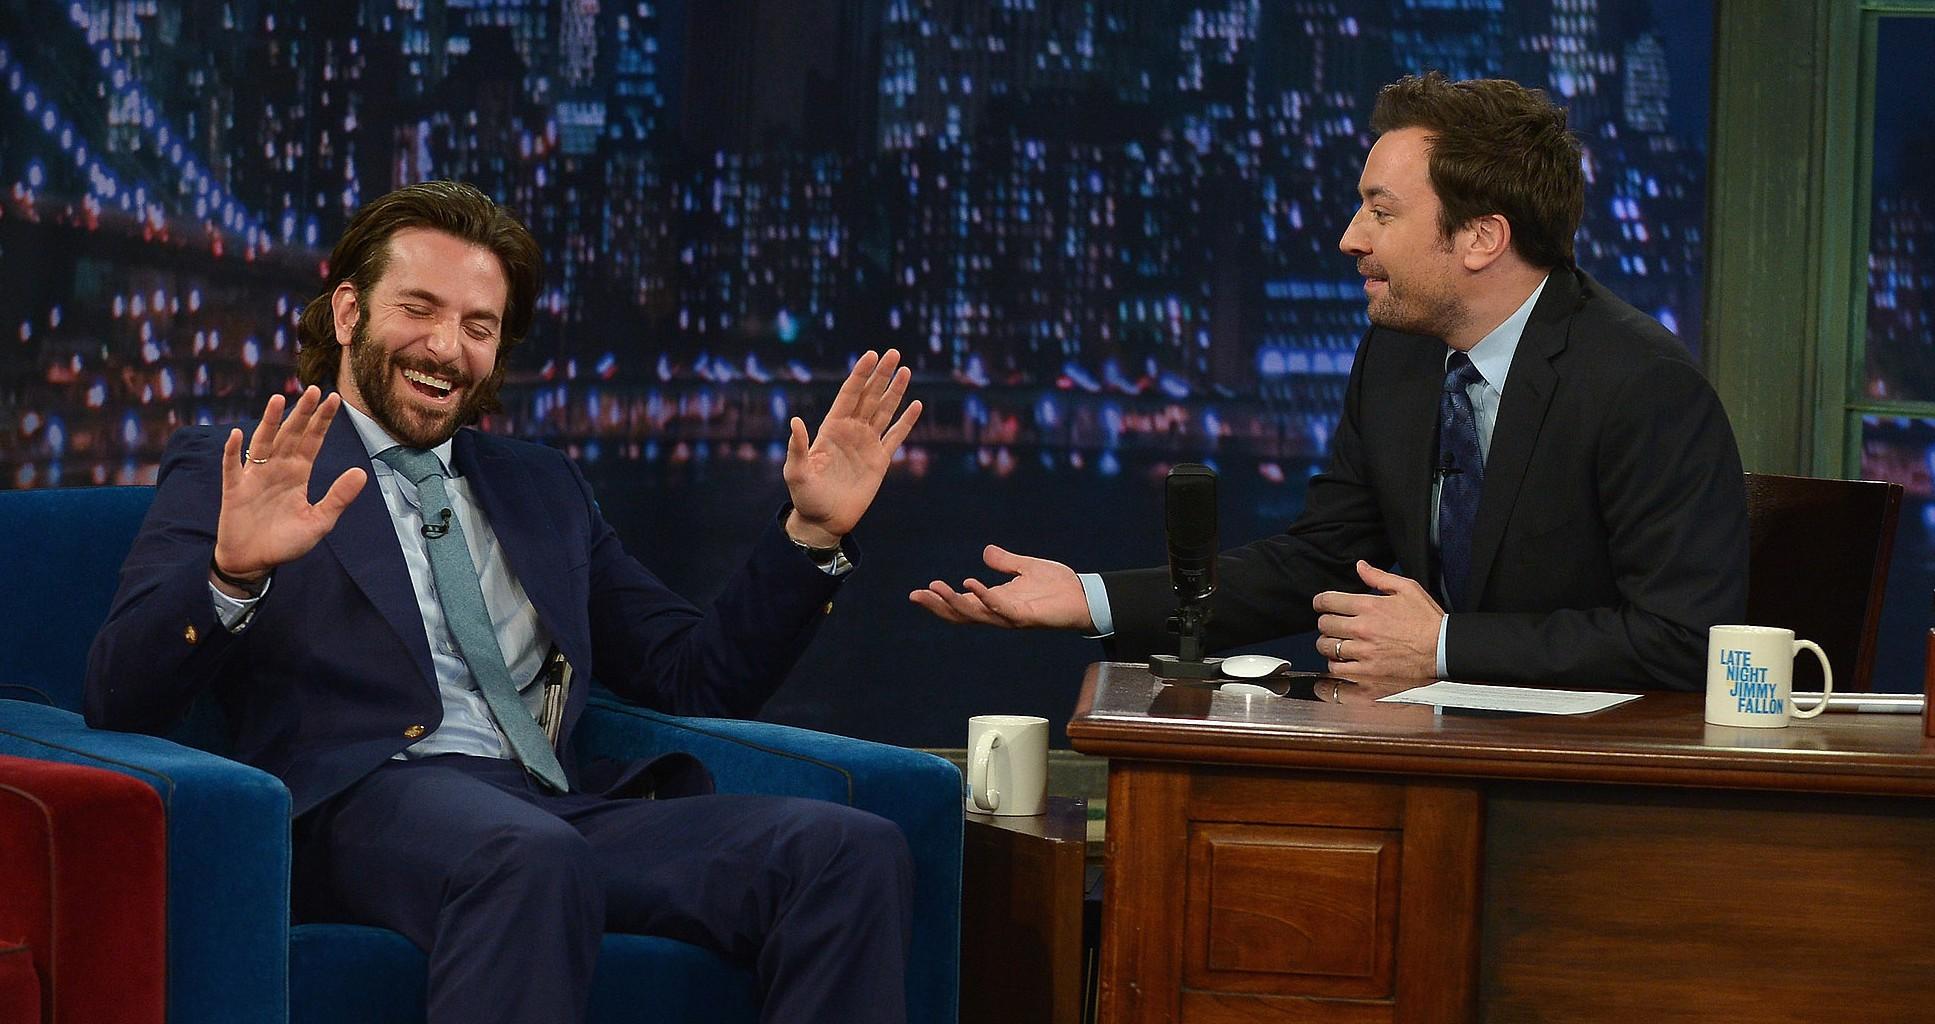 Bradley-Cooper-promoted-Hangover-Part-III-Late-Night